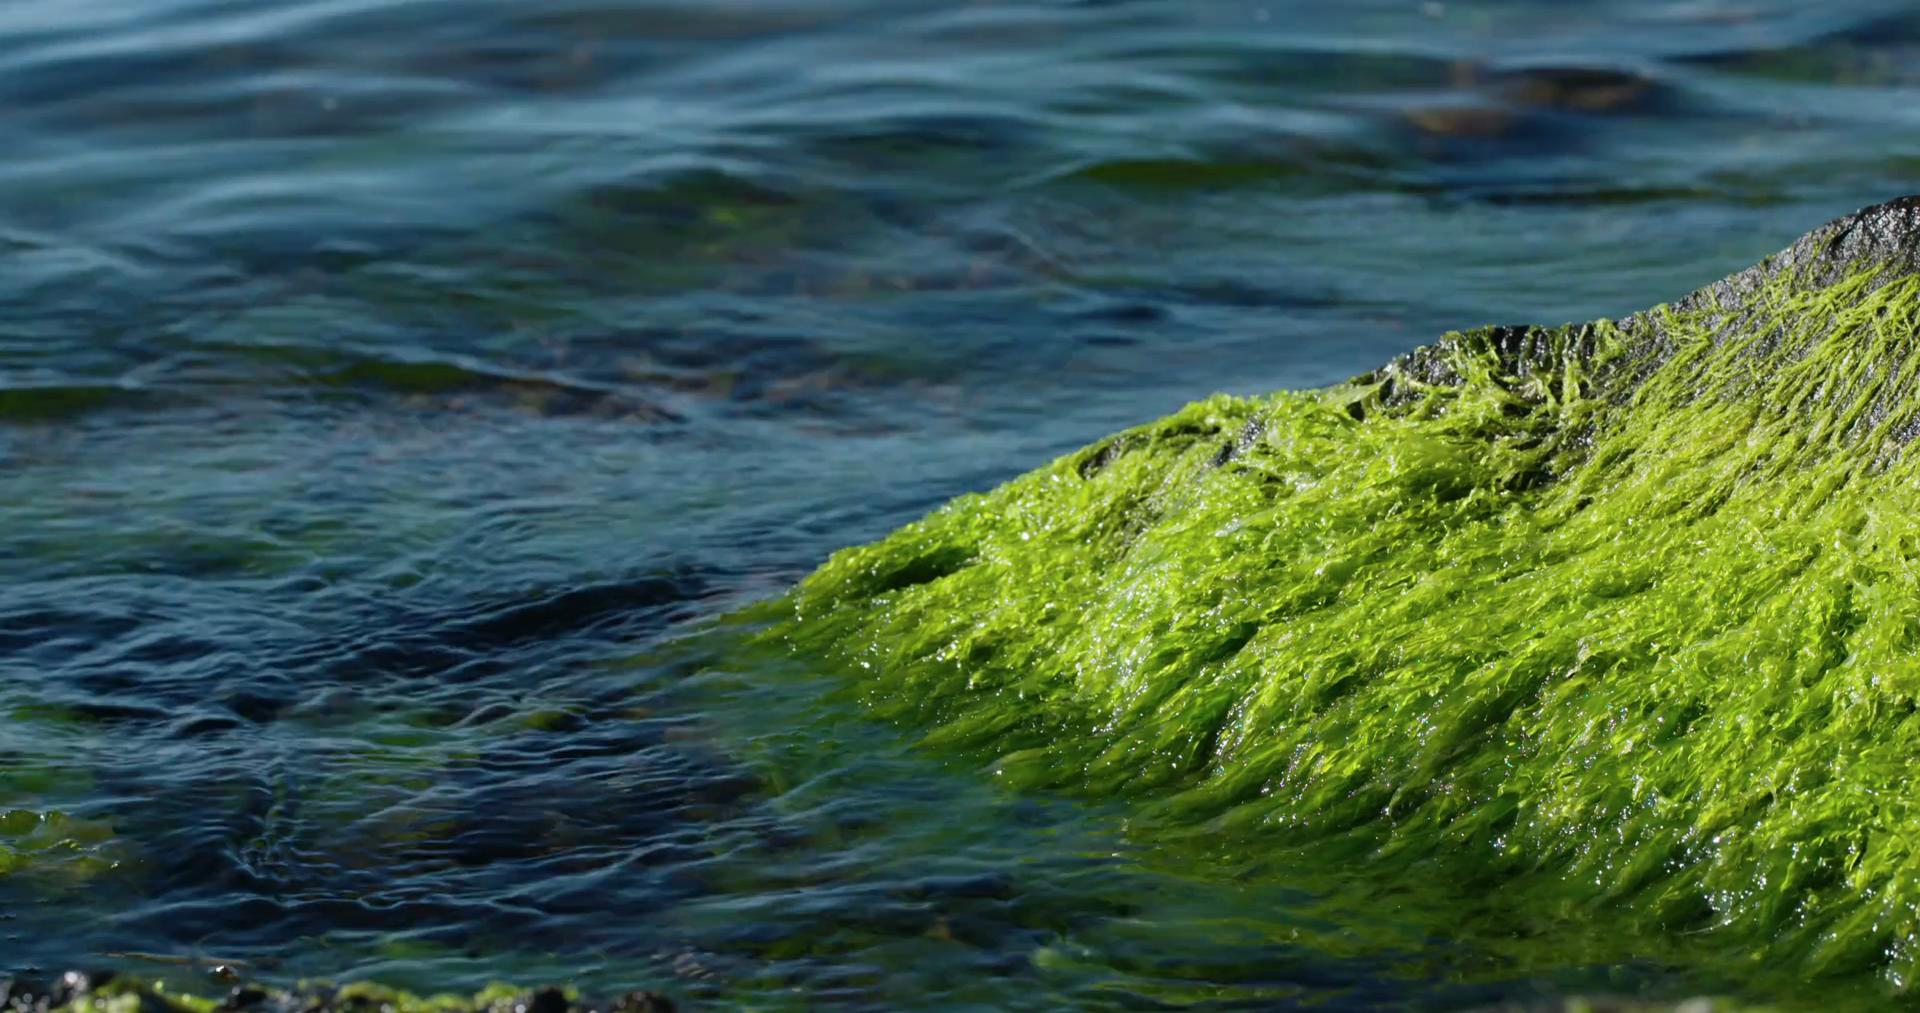 ocean waves crashing on algae covered rocks